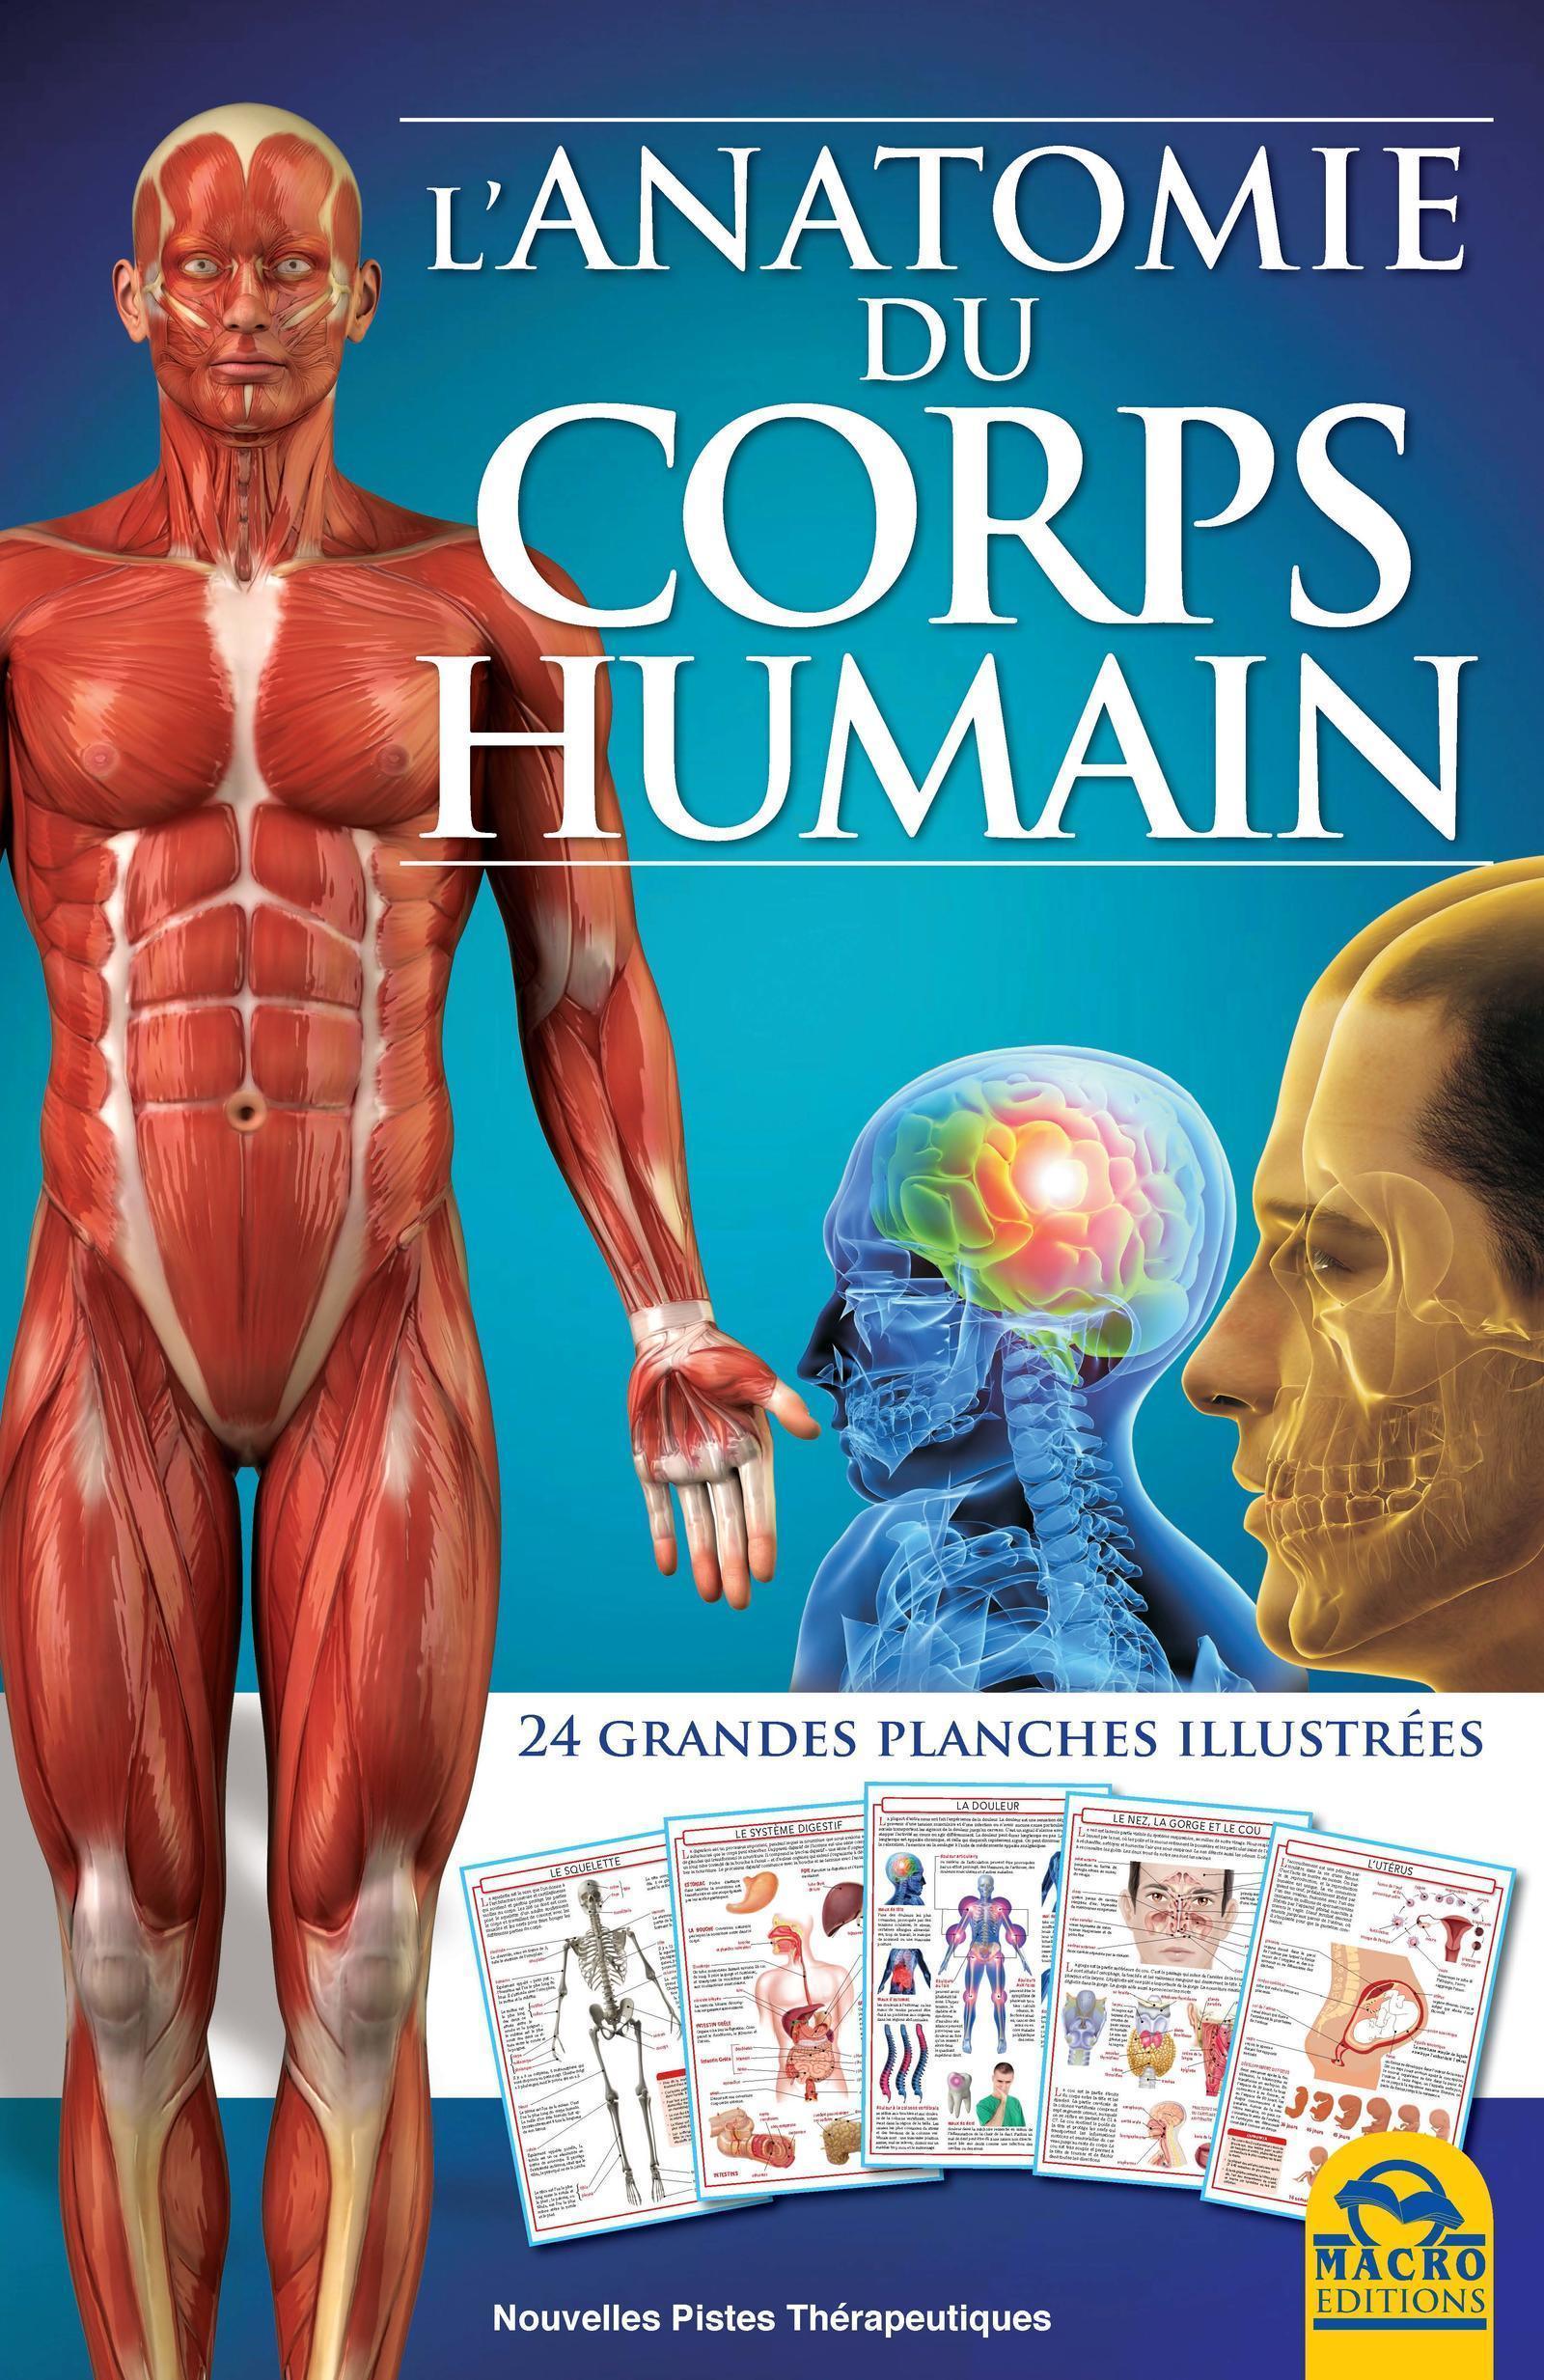 L ANATOMIE DU CORPS HUMAIN  24 GRANDES PLANCHES ILLUSTREES - 24 GRANDES PLANCHES ILLUSTREES.